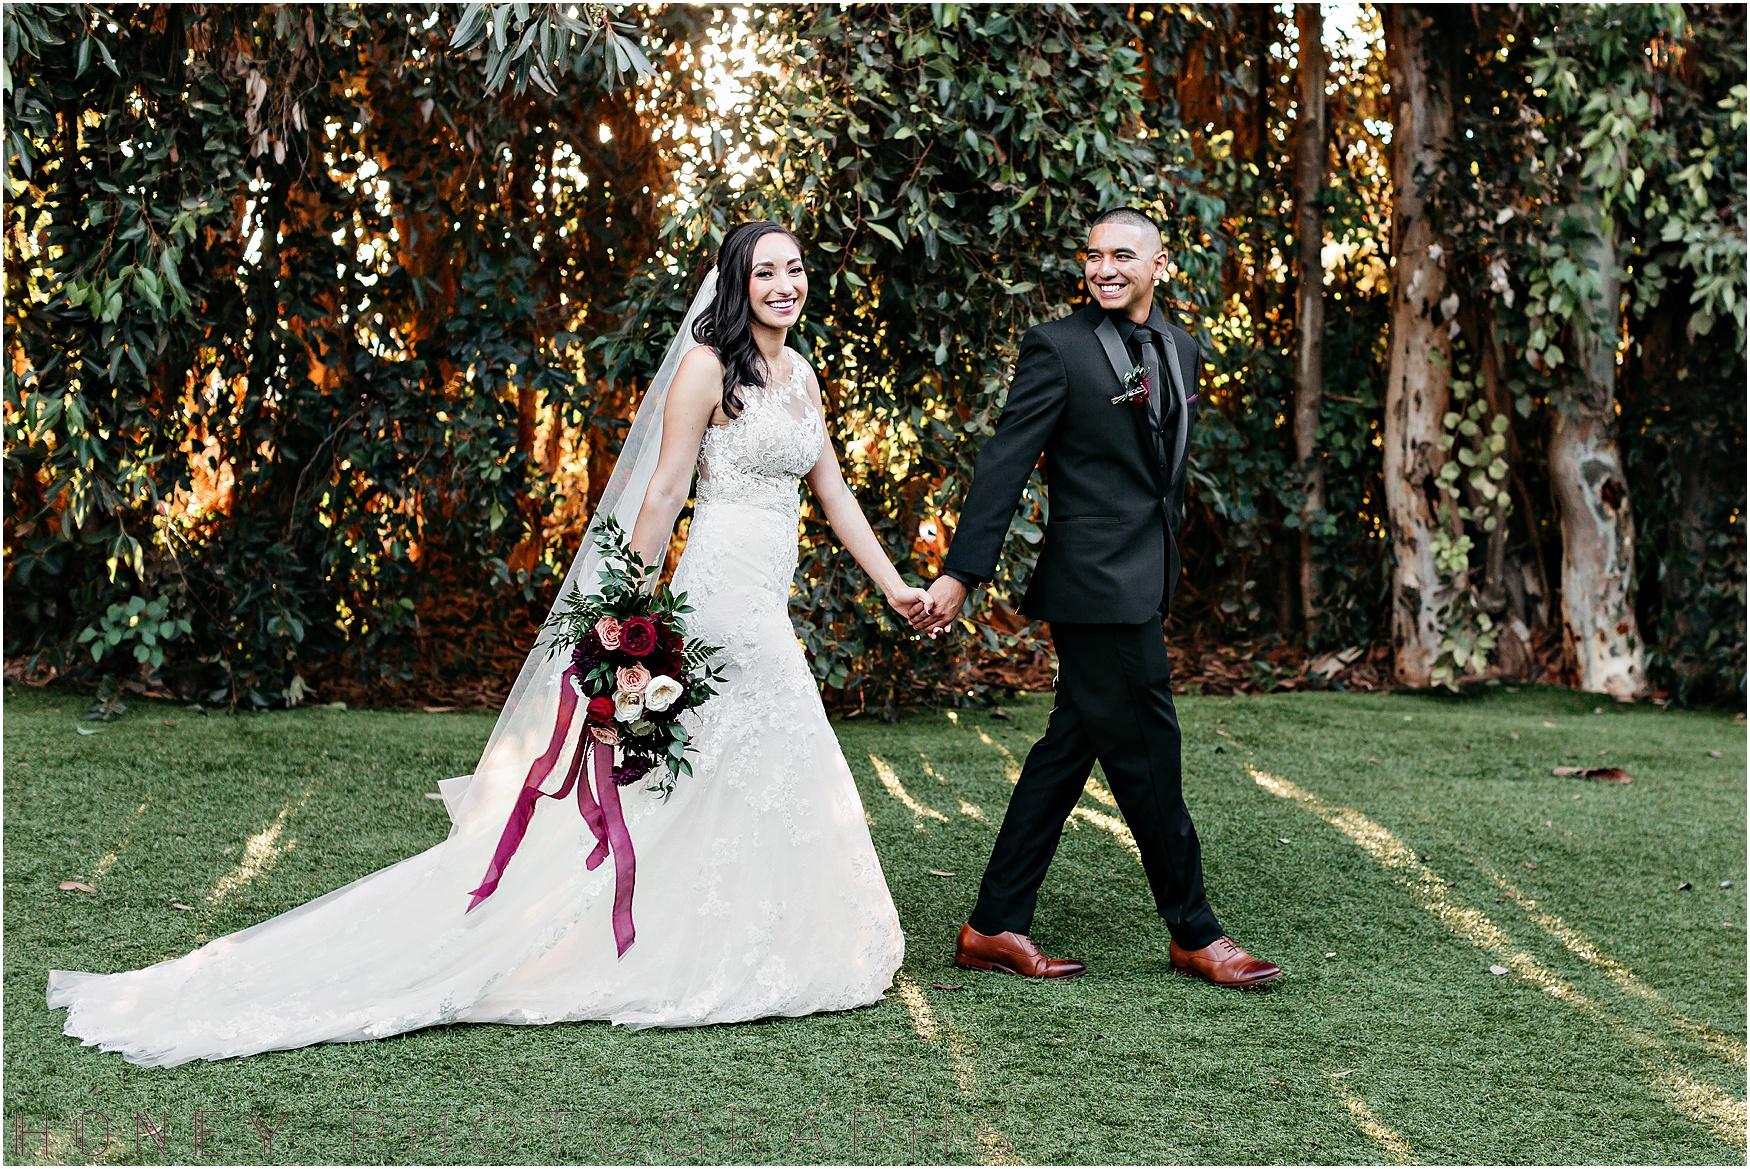 twin_oaks_garden_estate_fall_winter_burgundy_wedding042.jpg